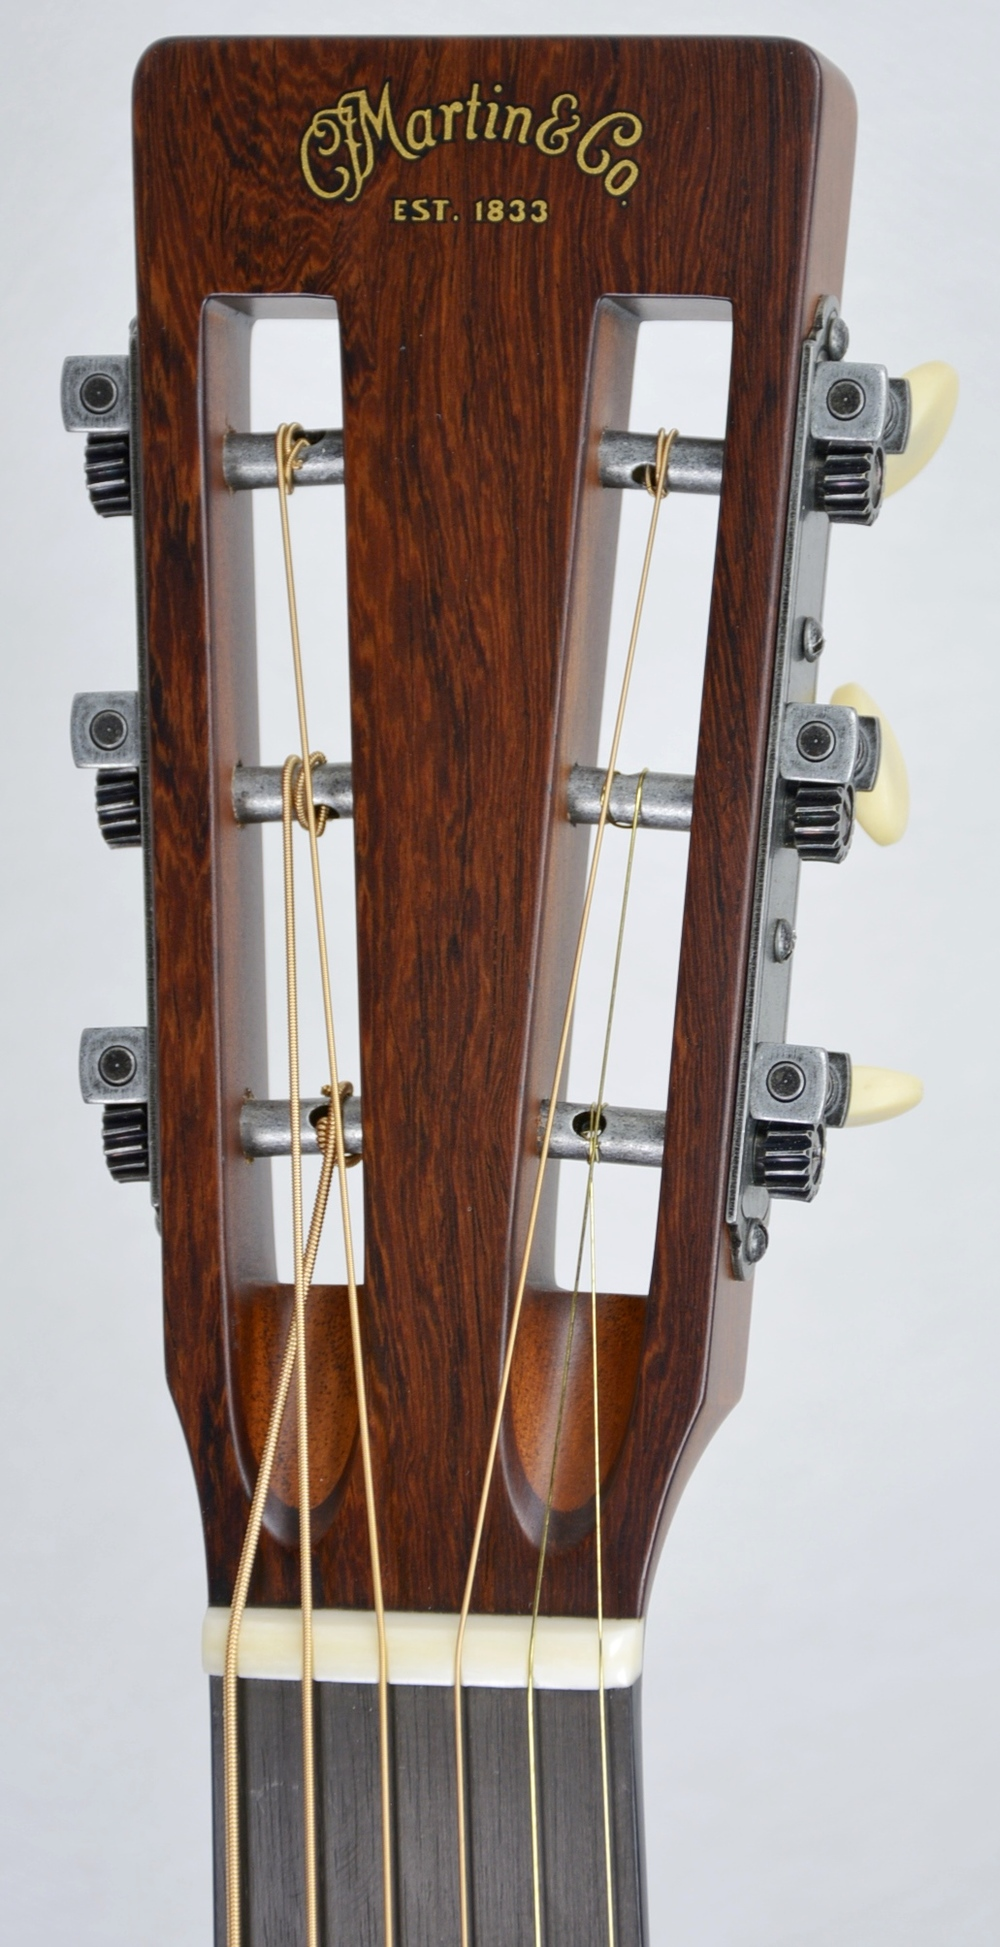 Q-2396024 S-1827233 00-12 Fiddleback Alpine Fine HB (4).JPG